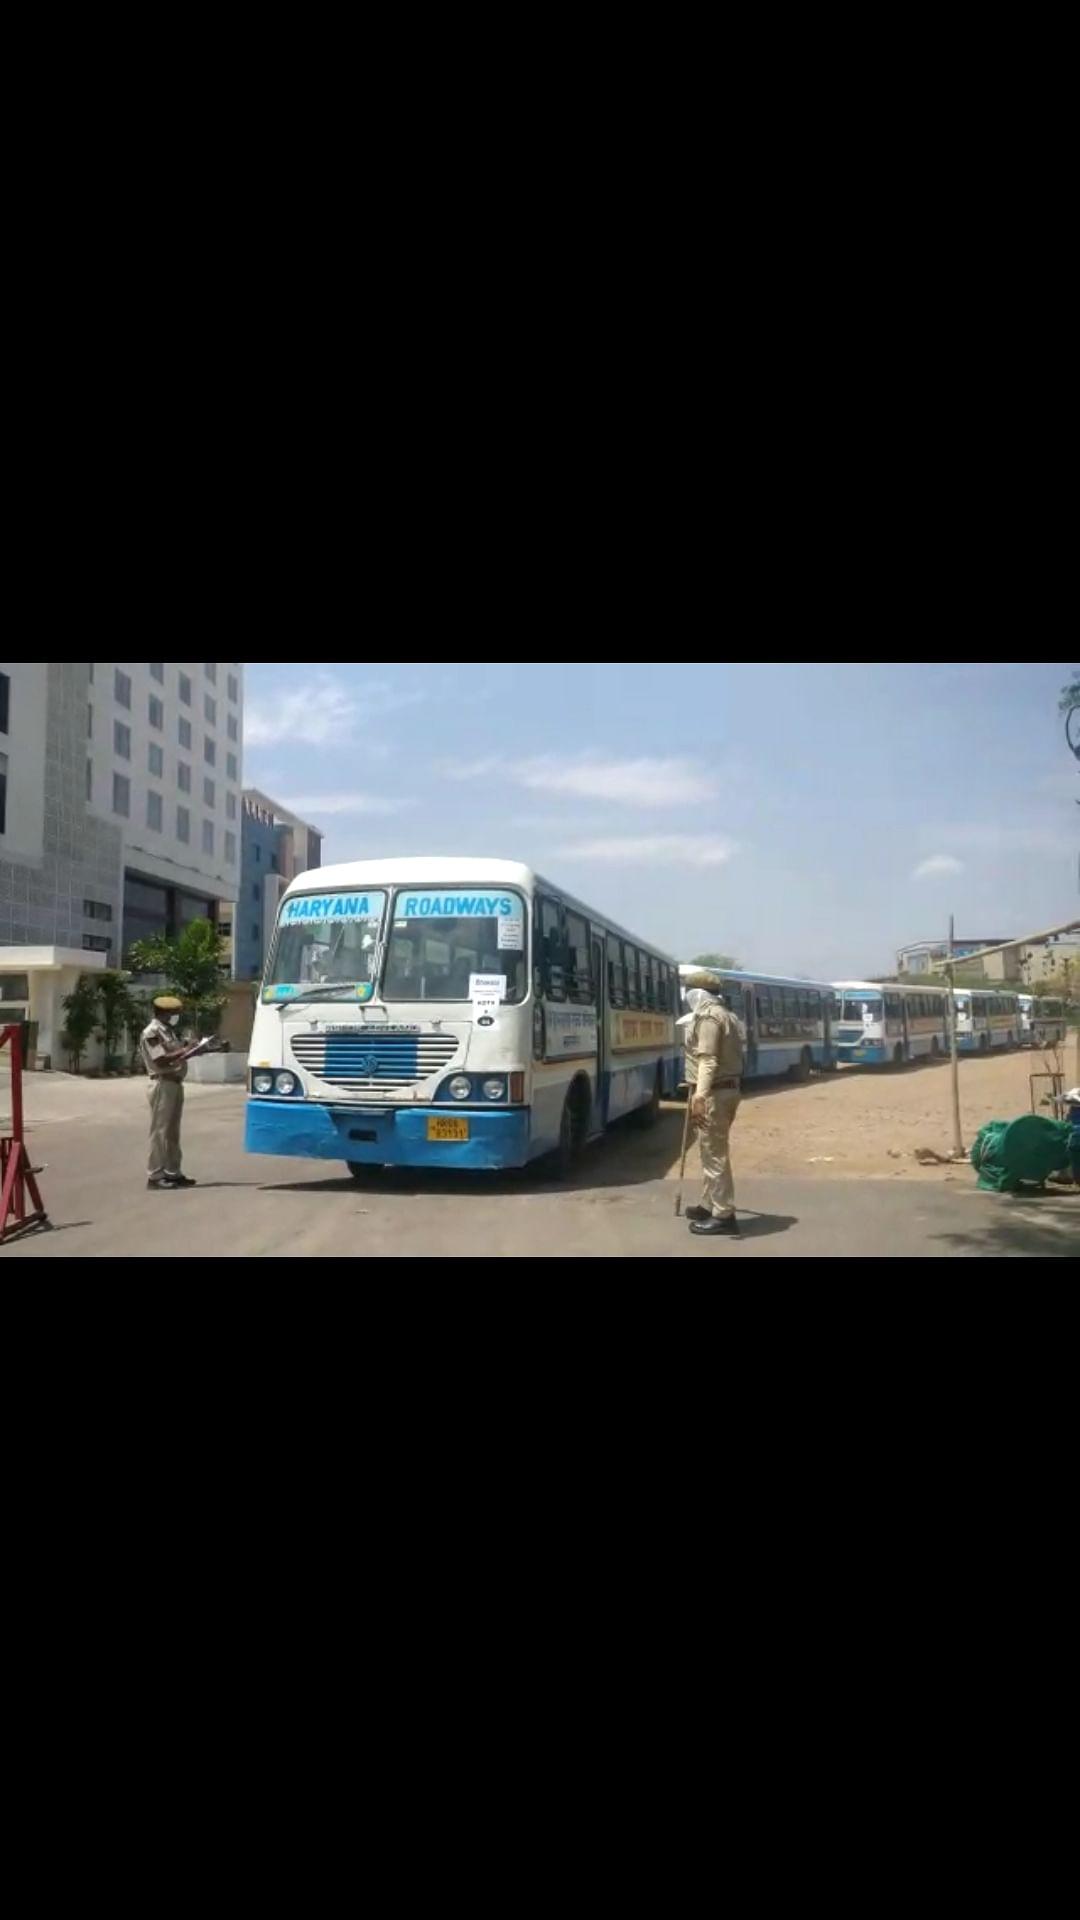 Stranded in Kota amid lockdown, Assam and Haryana students head back home